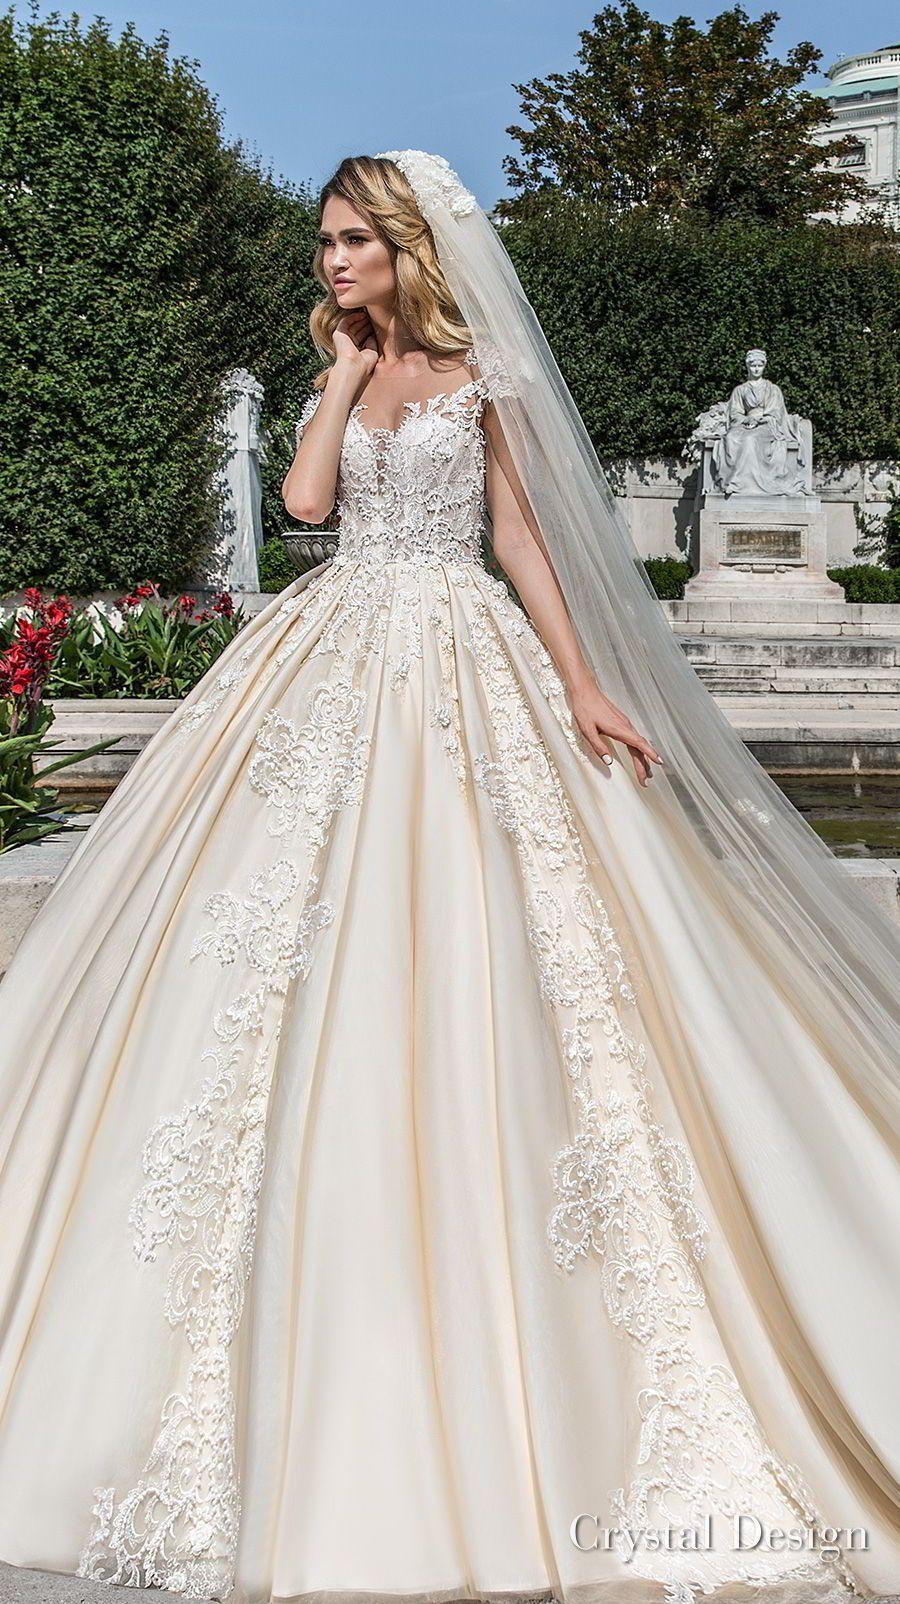 Dress Royce Available At Avancy Bridal In Phoenix Az Call Or